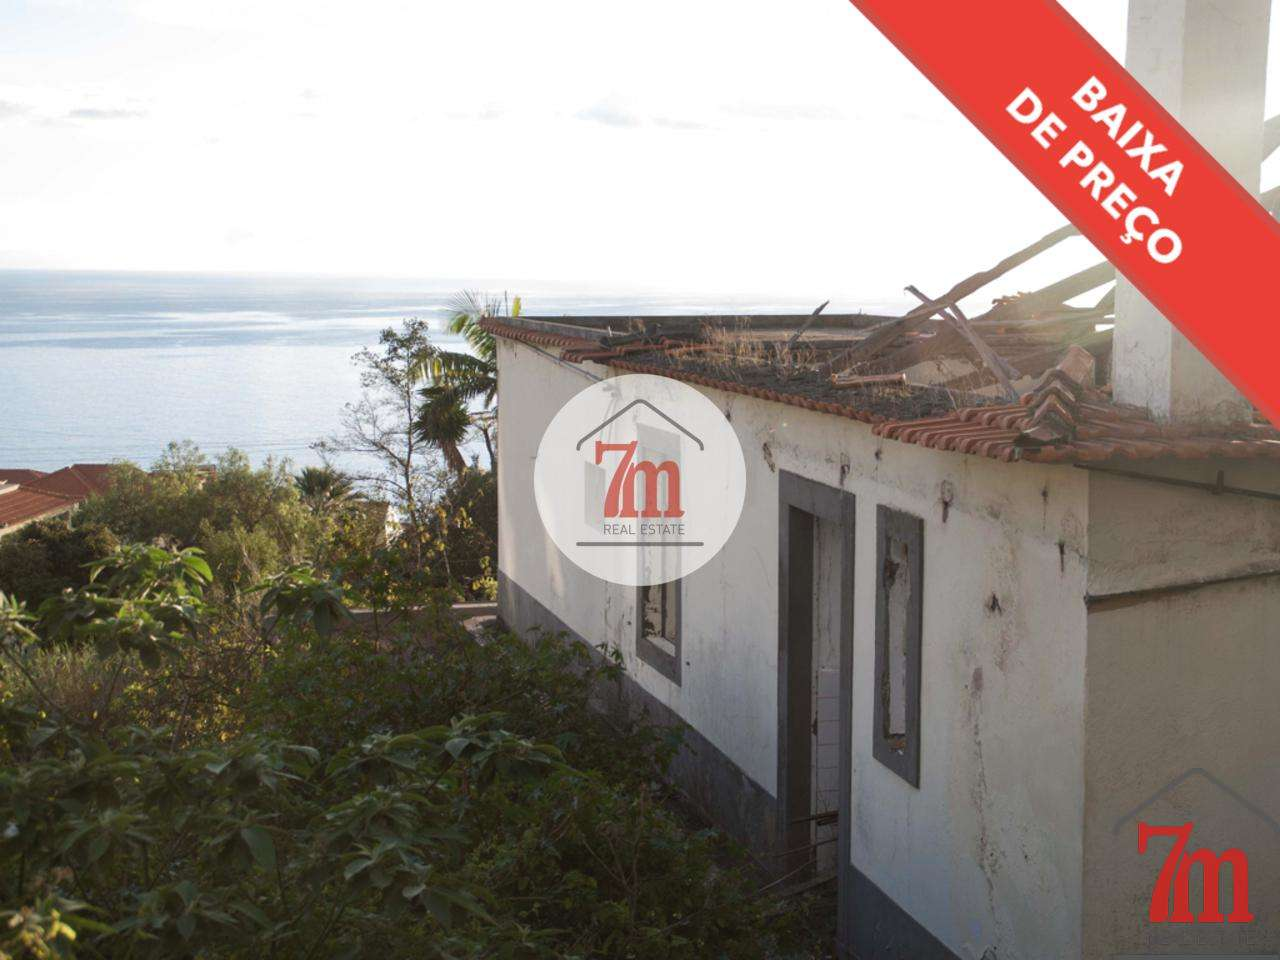 Terreno para comprar, Santa Maria Maior, Funchal, Ilha da Madeira - Foto 5